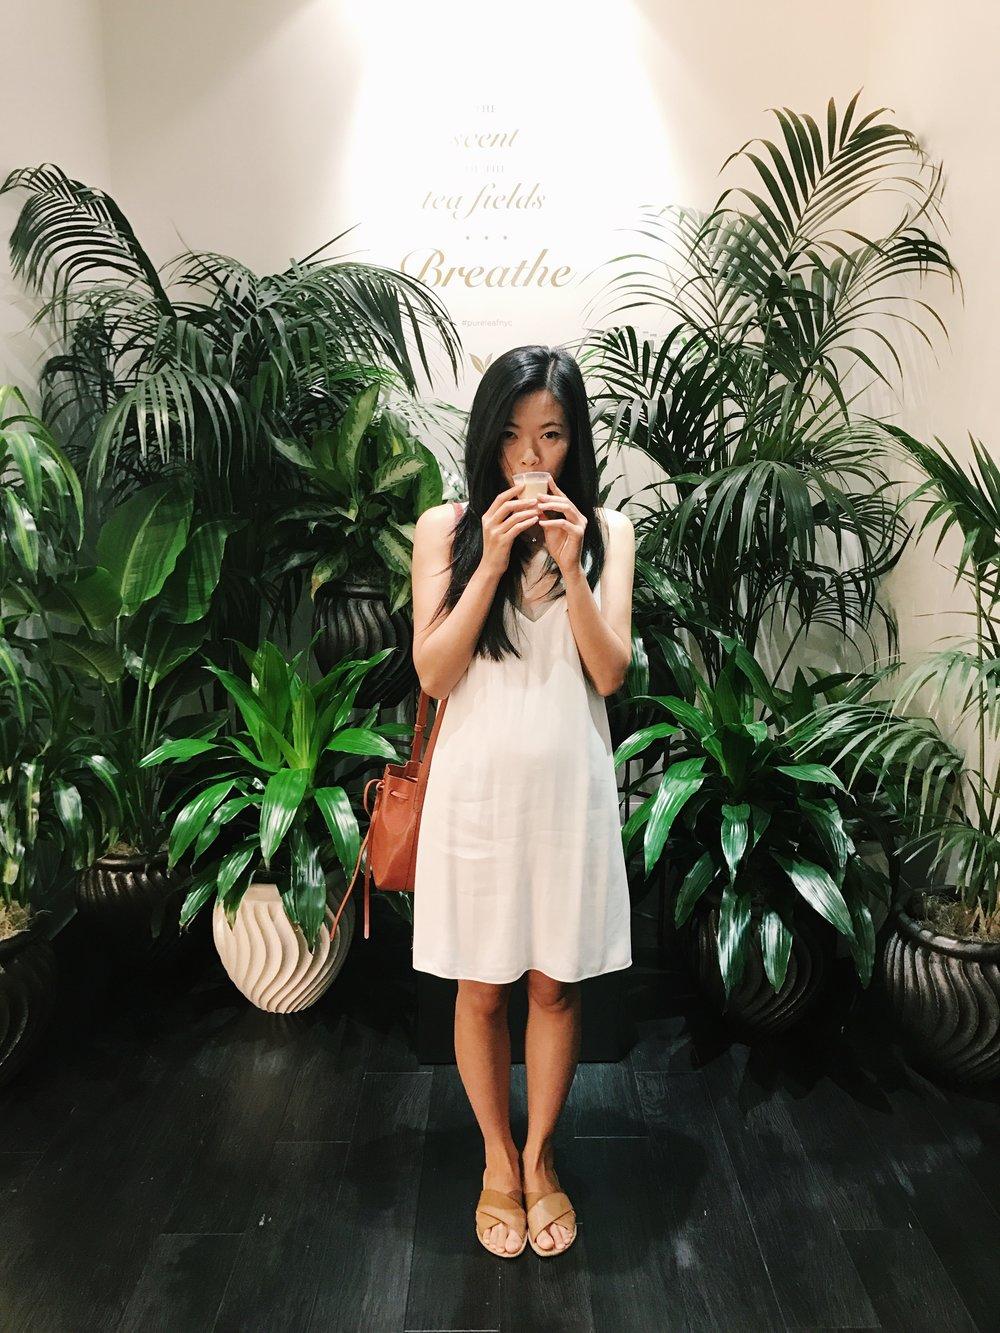 leanne wei honeyandvelvet at pure leaf tea house nyc